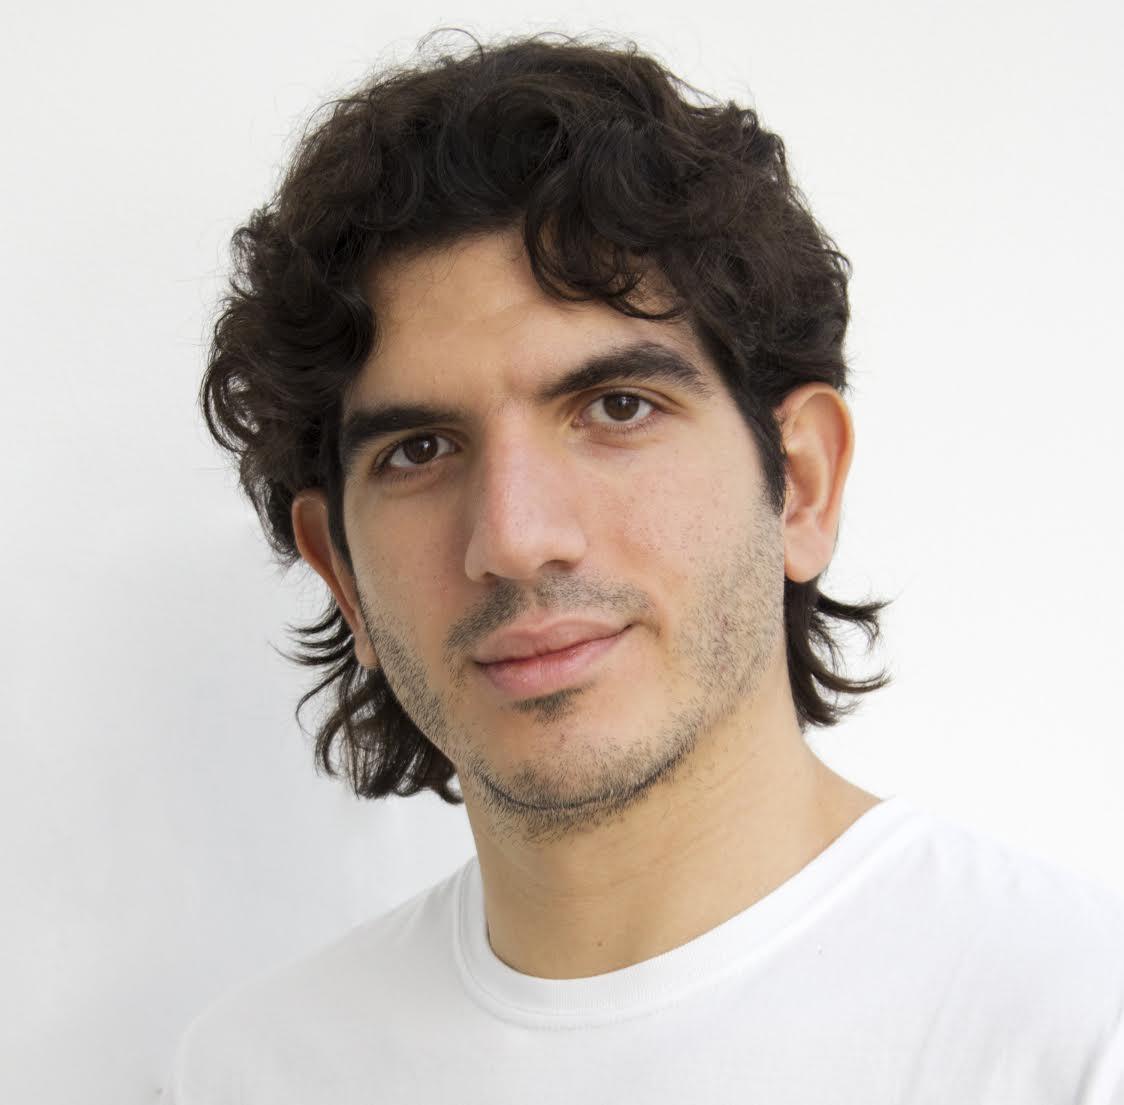 Santiago Palladino